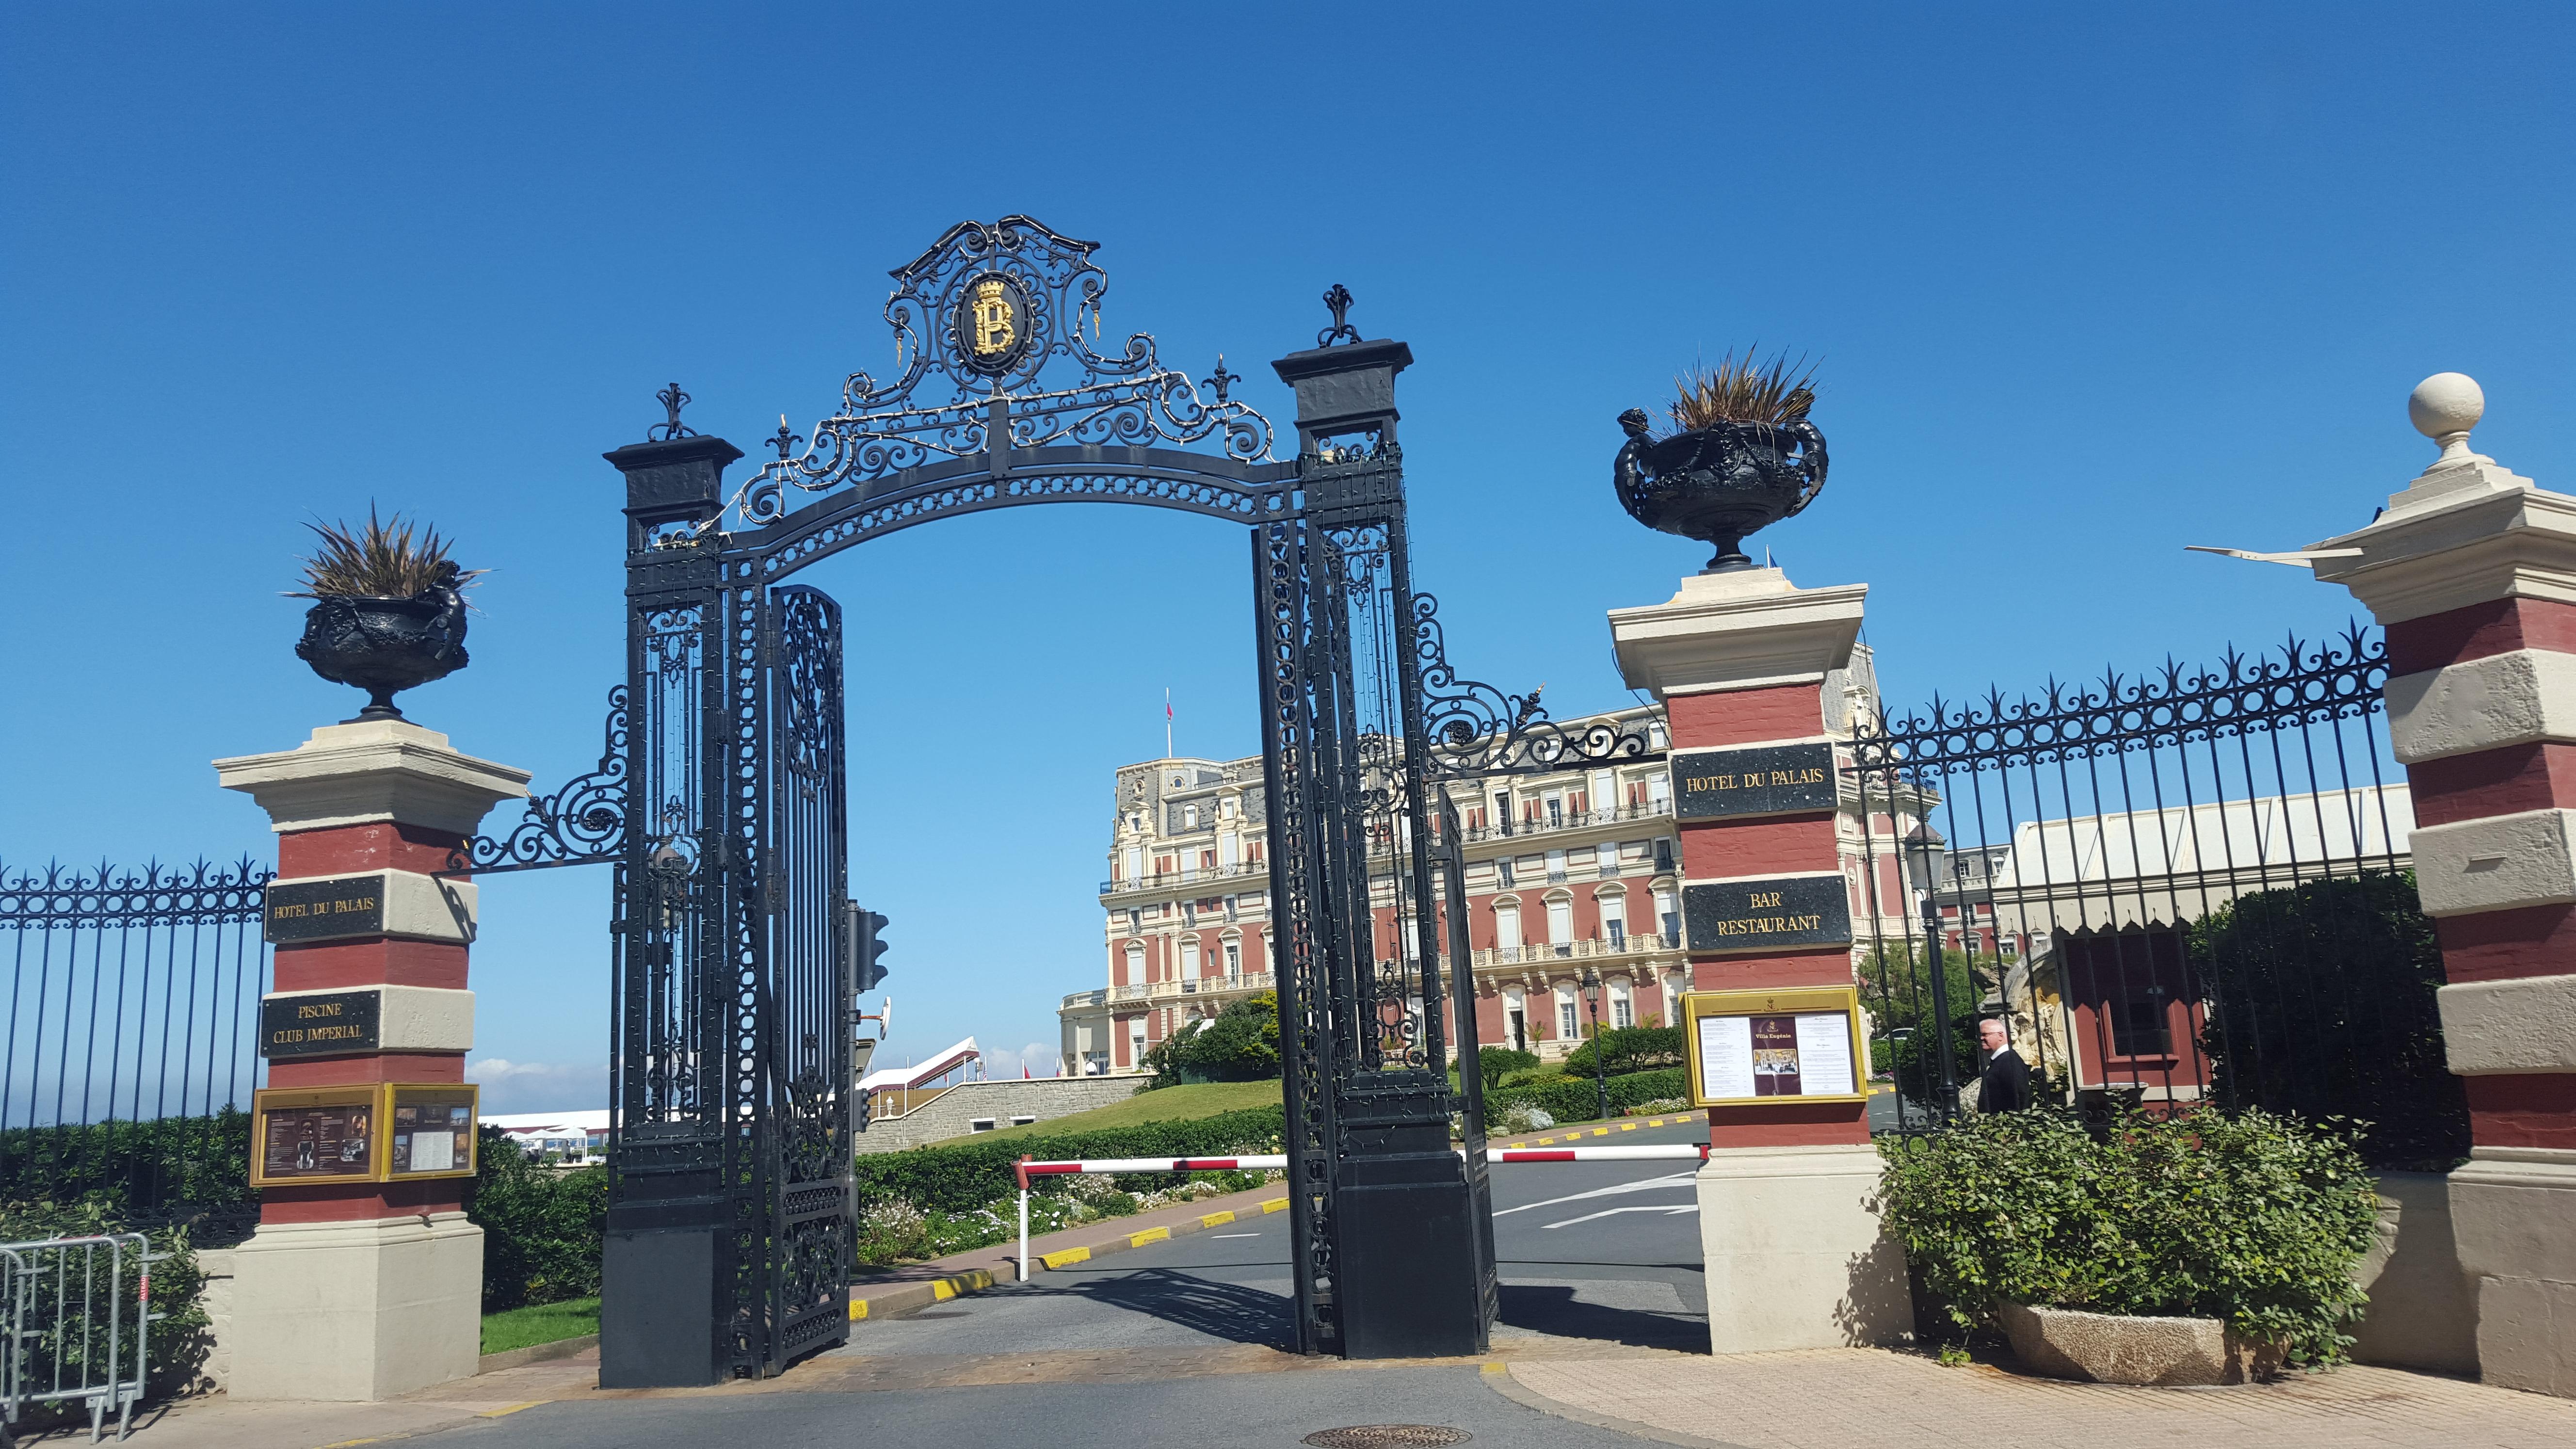 Entrance to Hotel du Palais